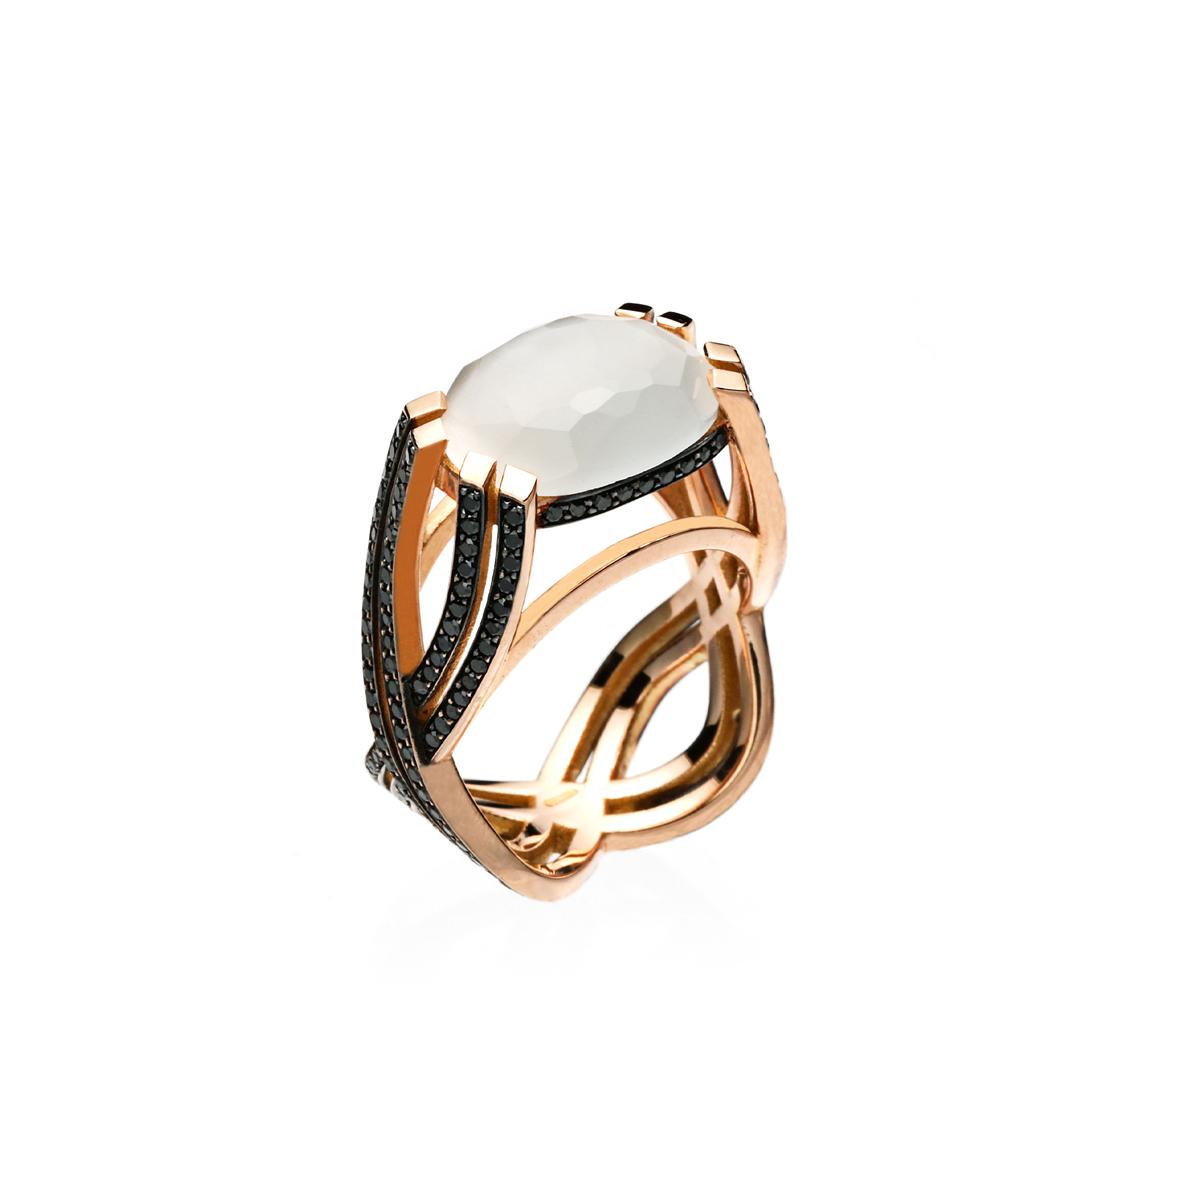 White Quartz Ring with Black Diamonds